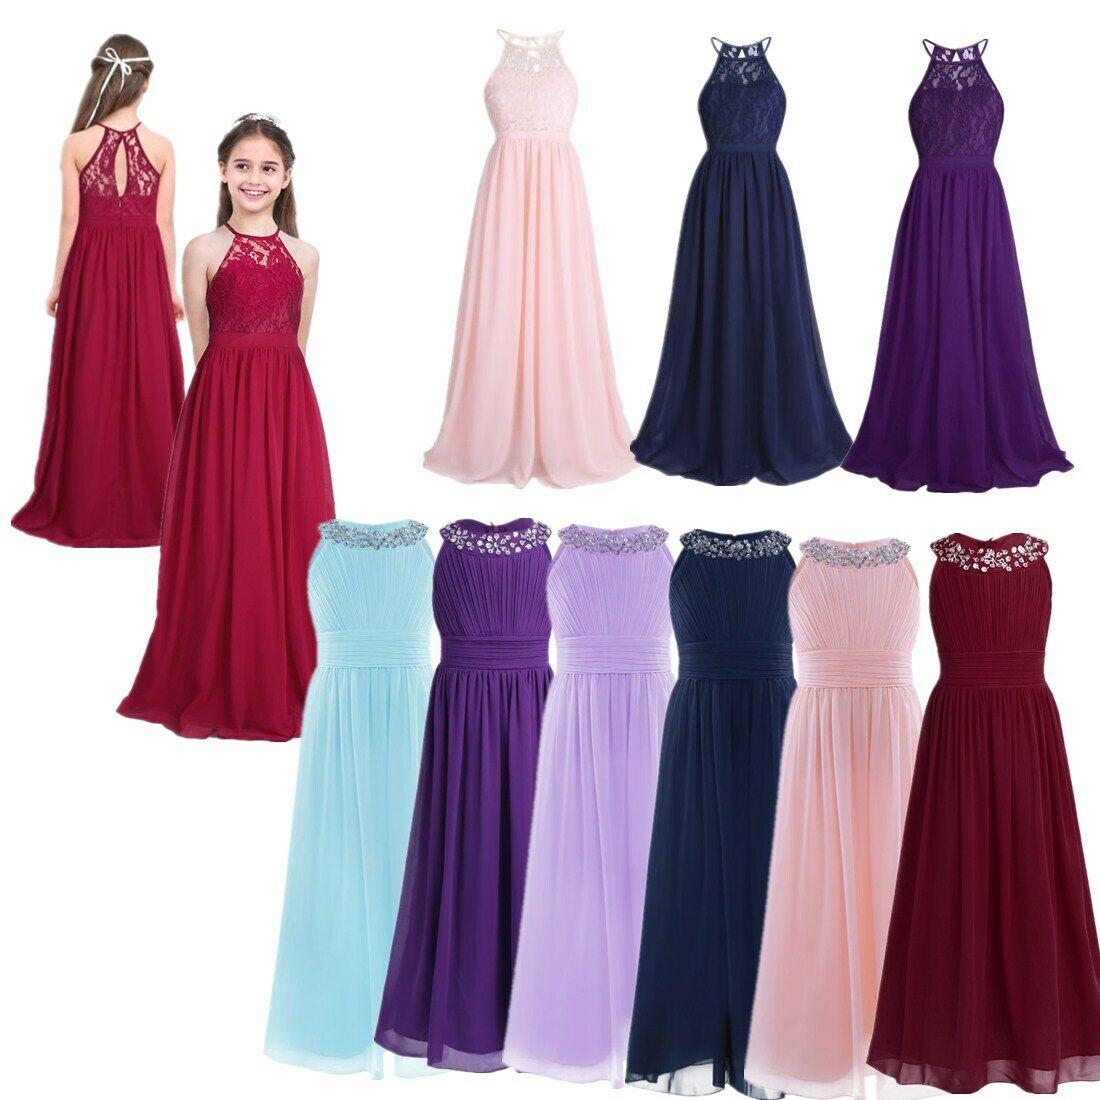 Flower Girl Bridesmaid Dress Sequin Maxi Dresses Party Princess Wedding Gown